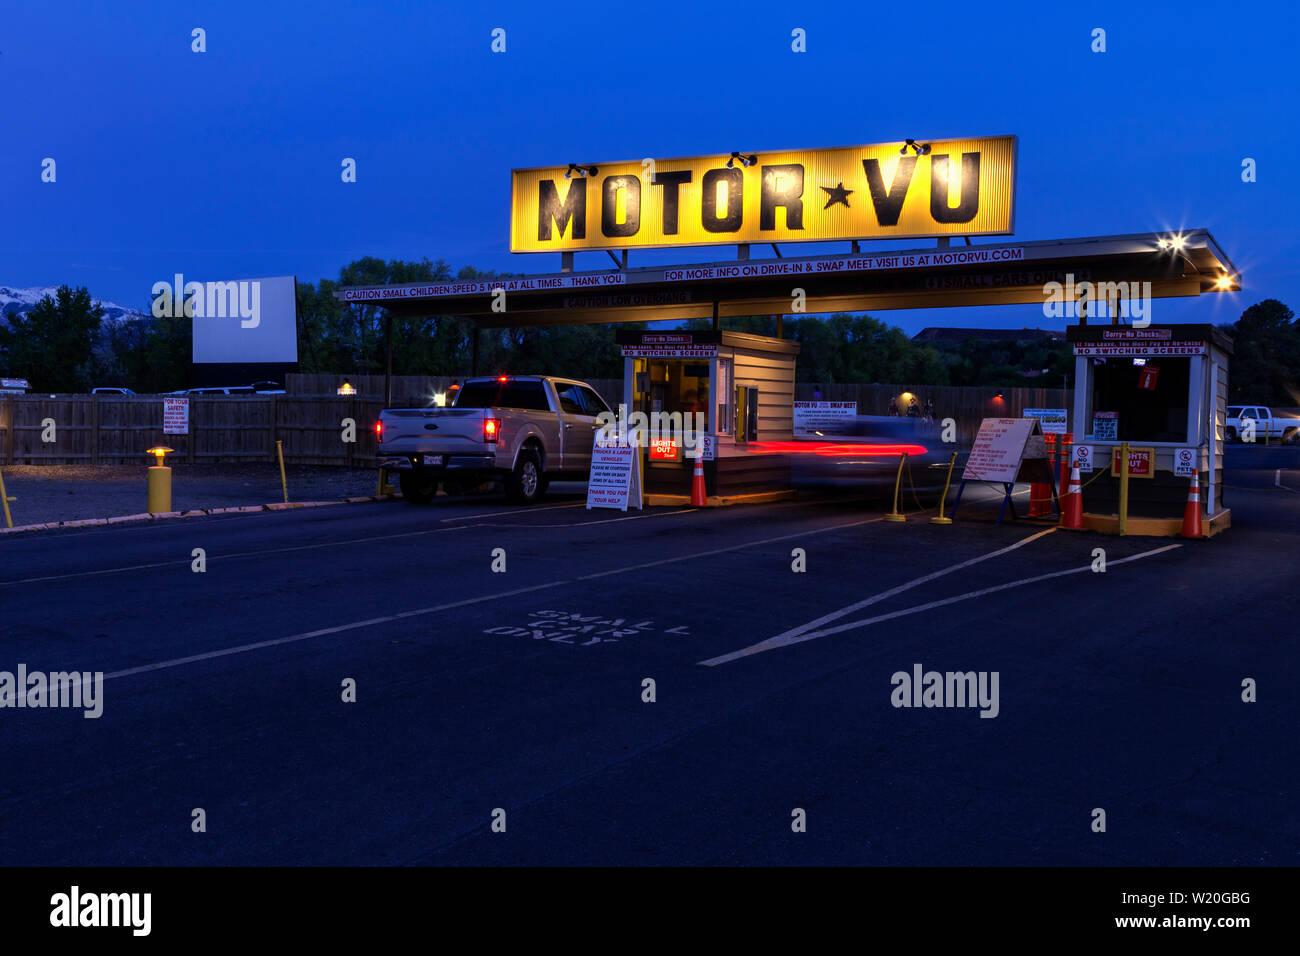 Motor Vu Drive In In Riverdale Utah Stock Photo Alamy